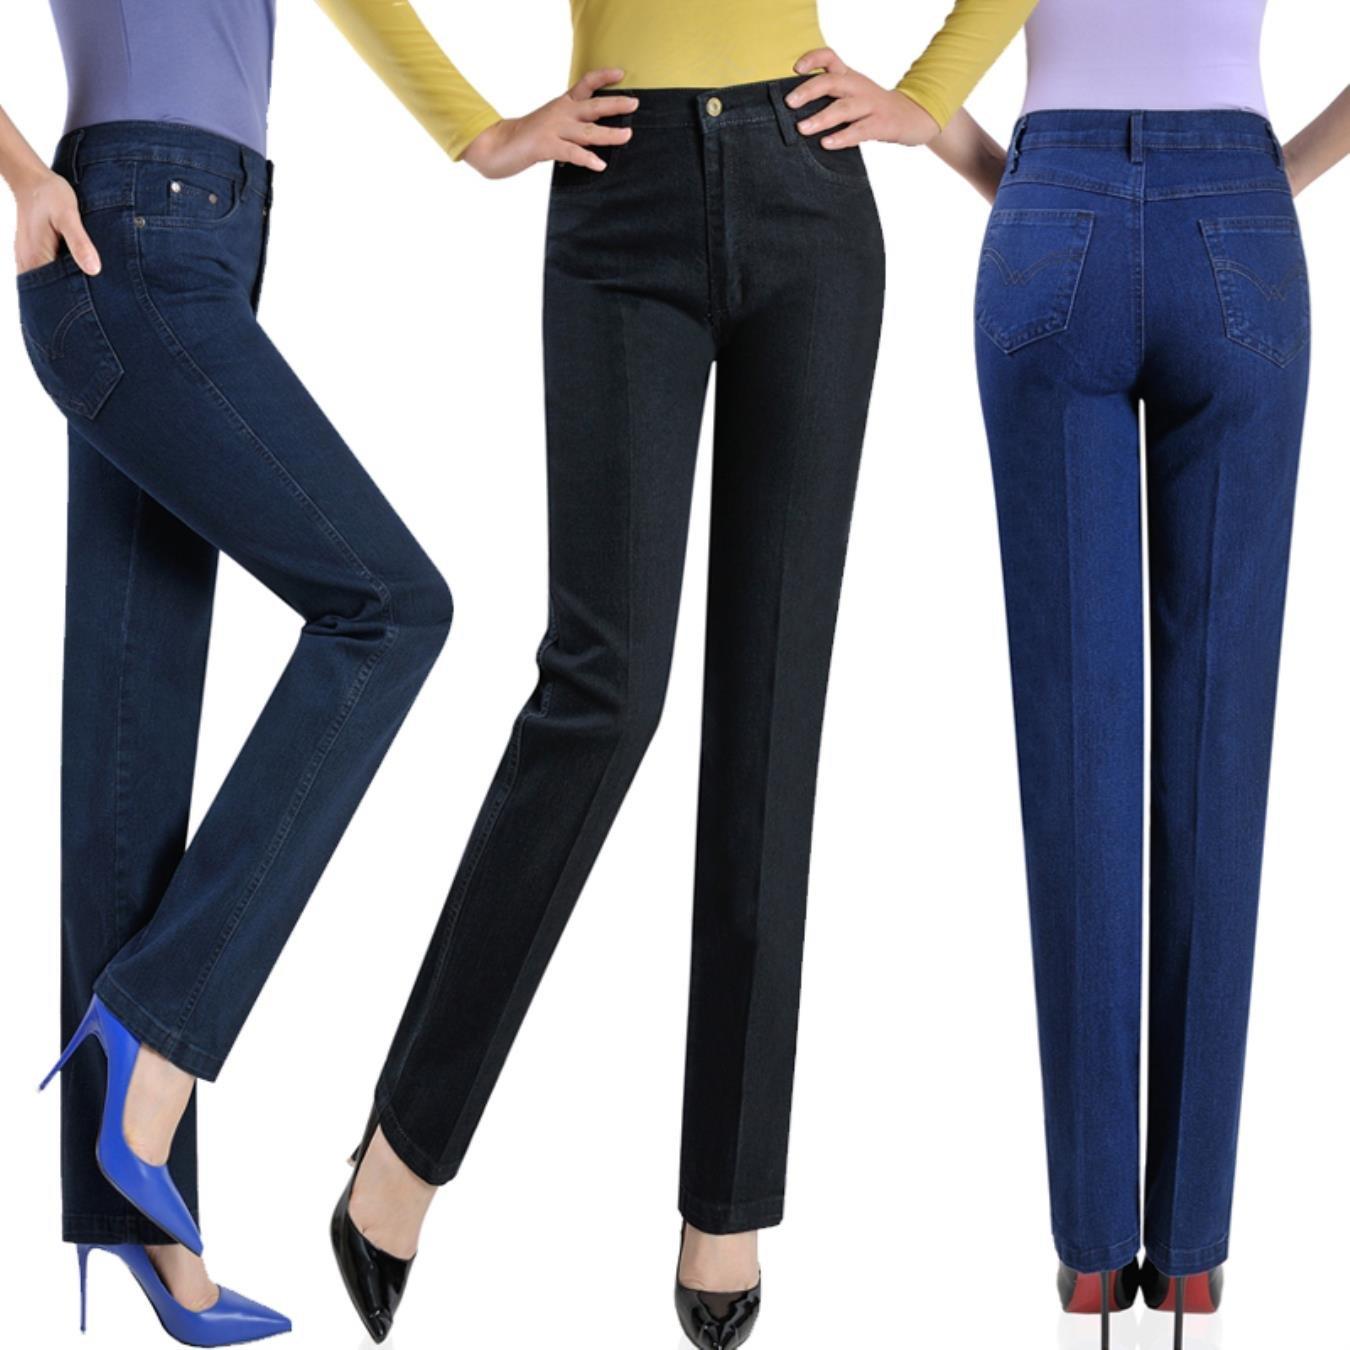 Swellog Spring Summer Women High Waist Elastic Plus Size Jeans Straight Denim Pants